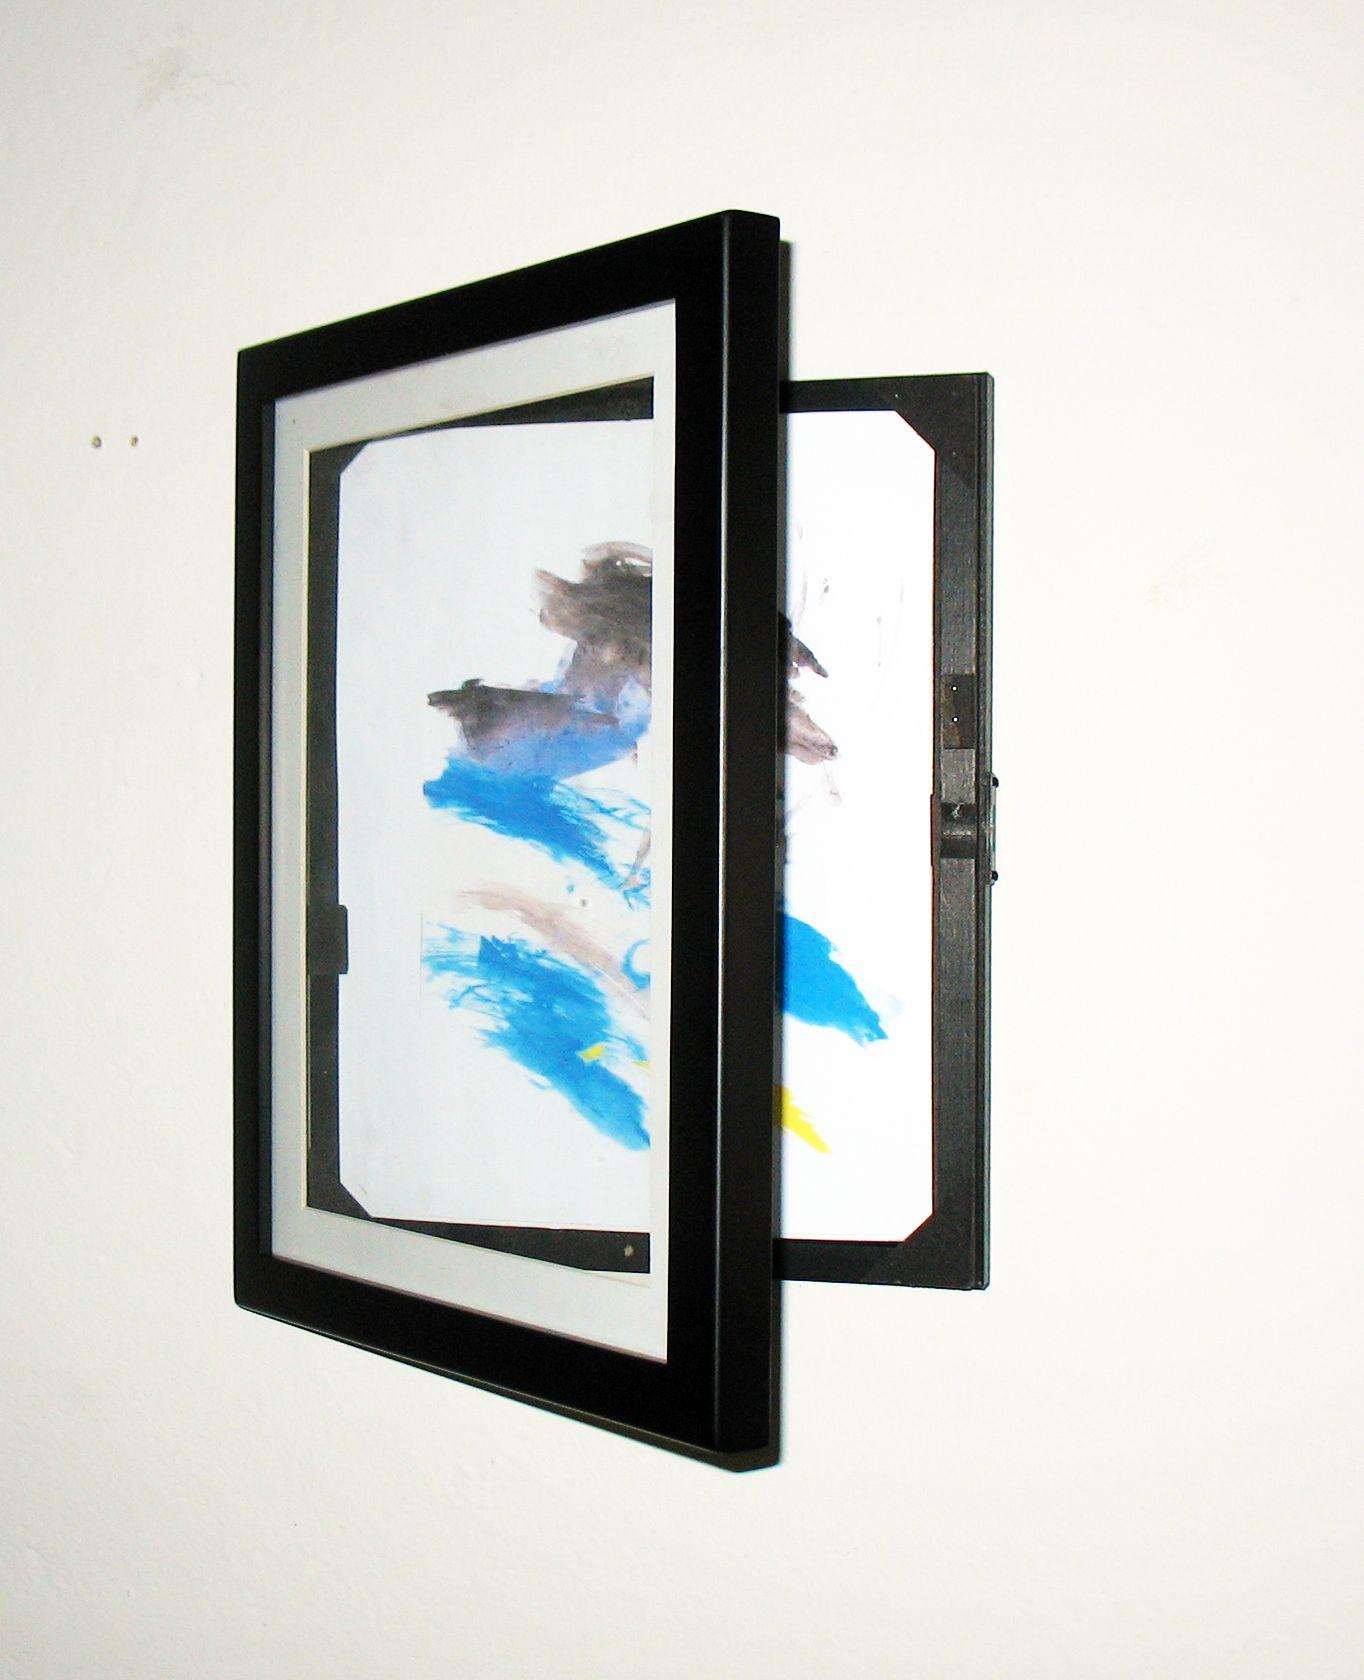 dynamic frames 85x11 lil davinci art cabinet ld kids displays - Dynamic Frames